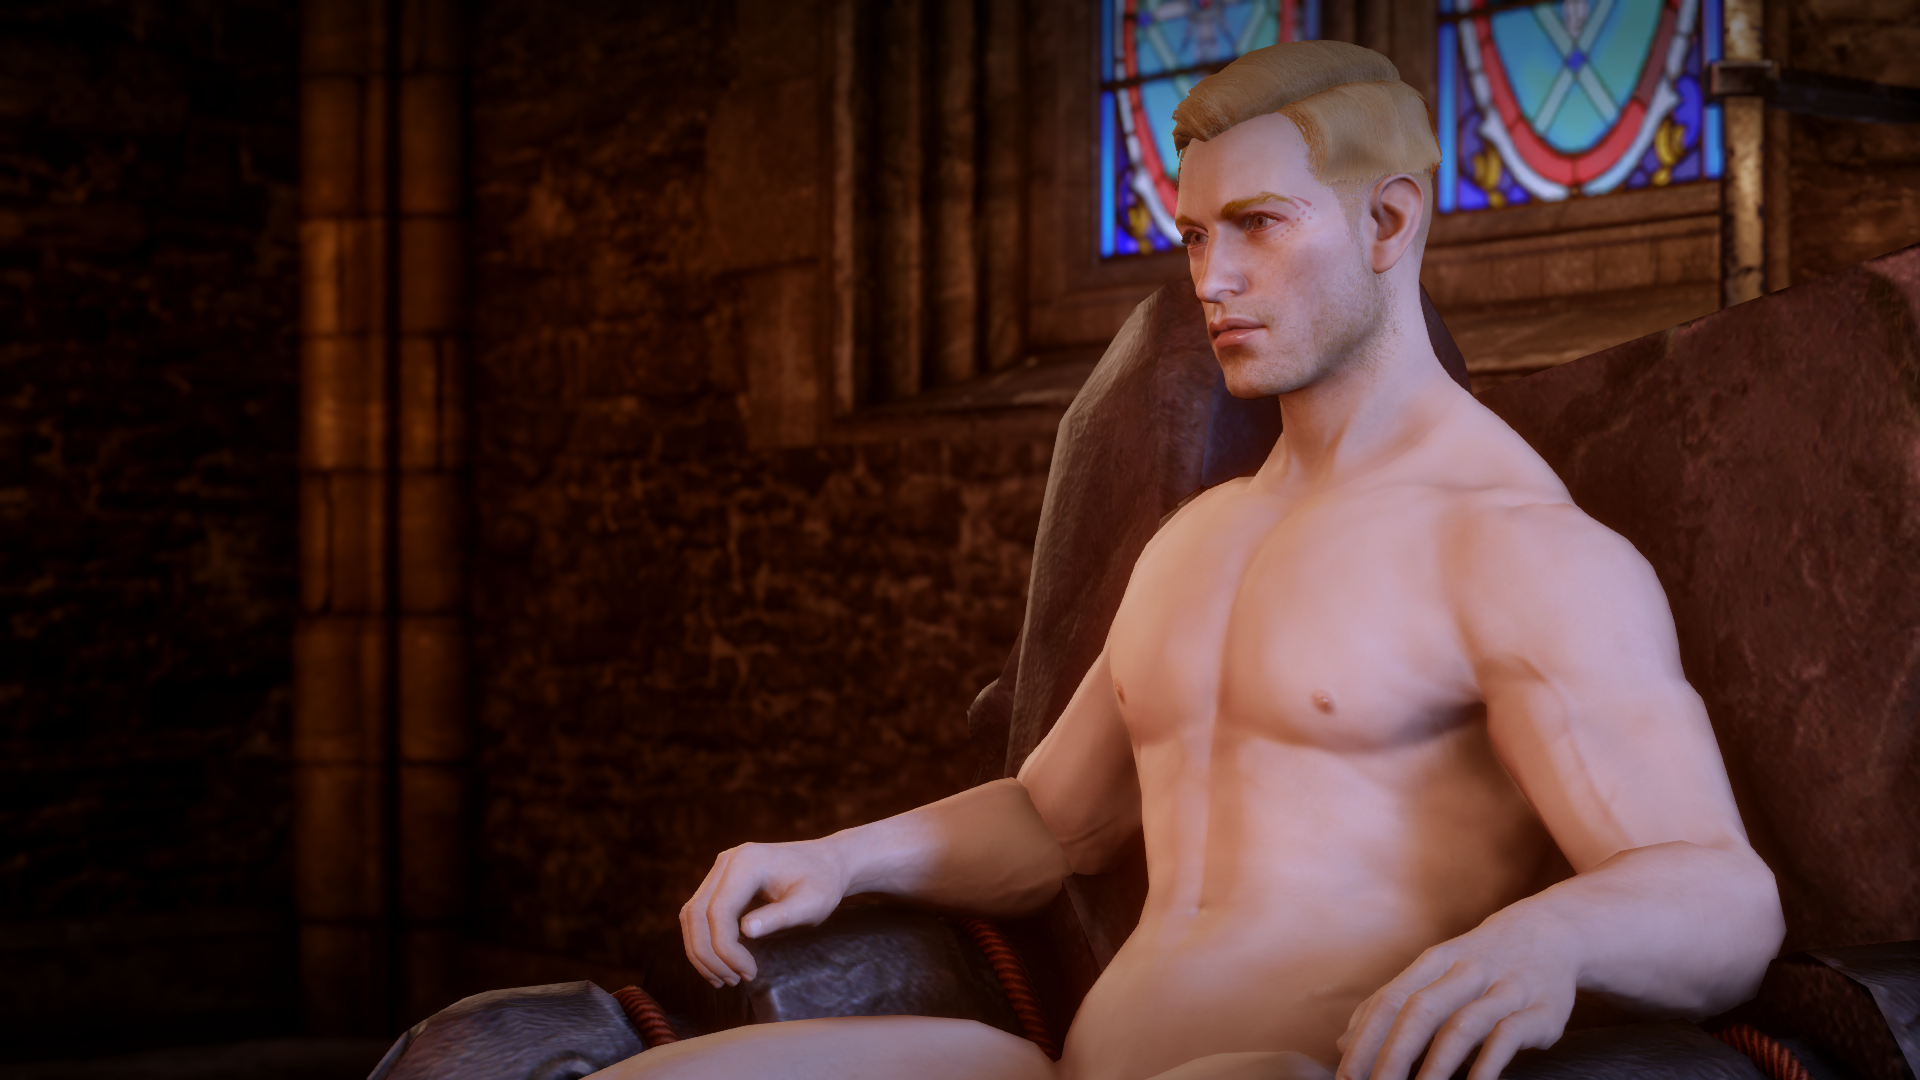 Порно моды для dragon age для мага